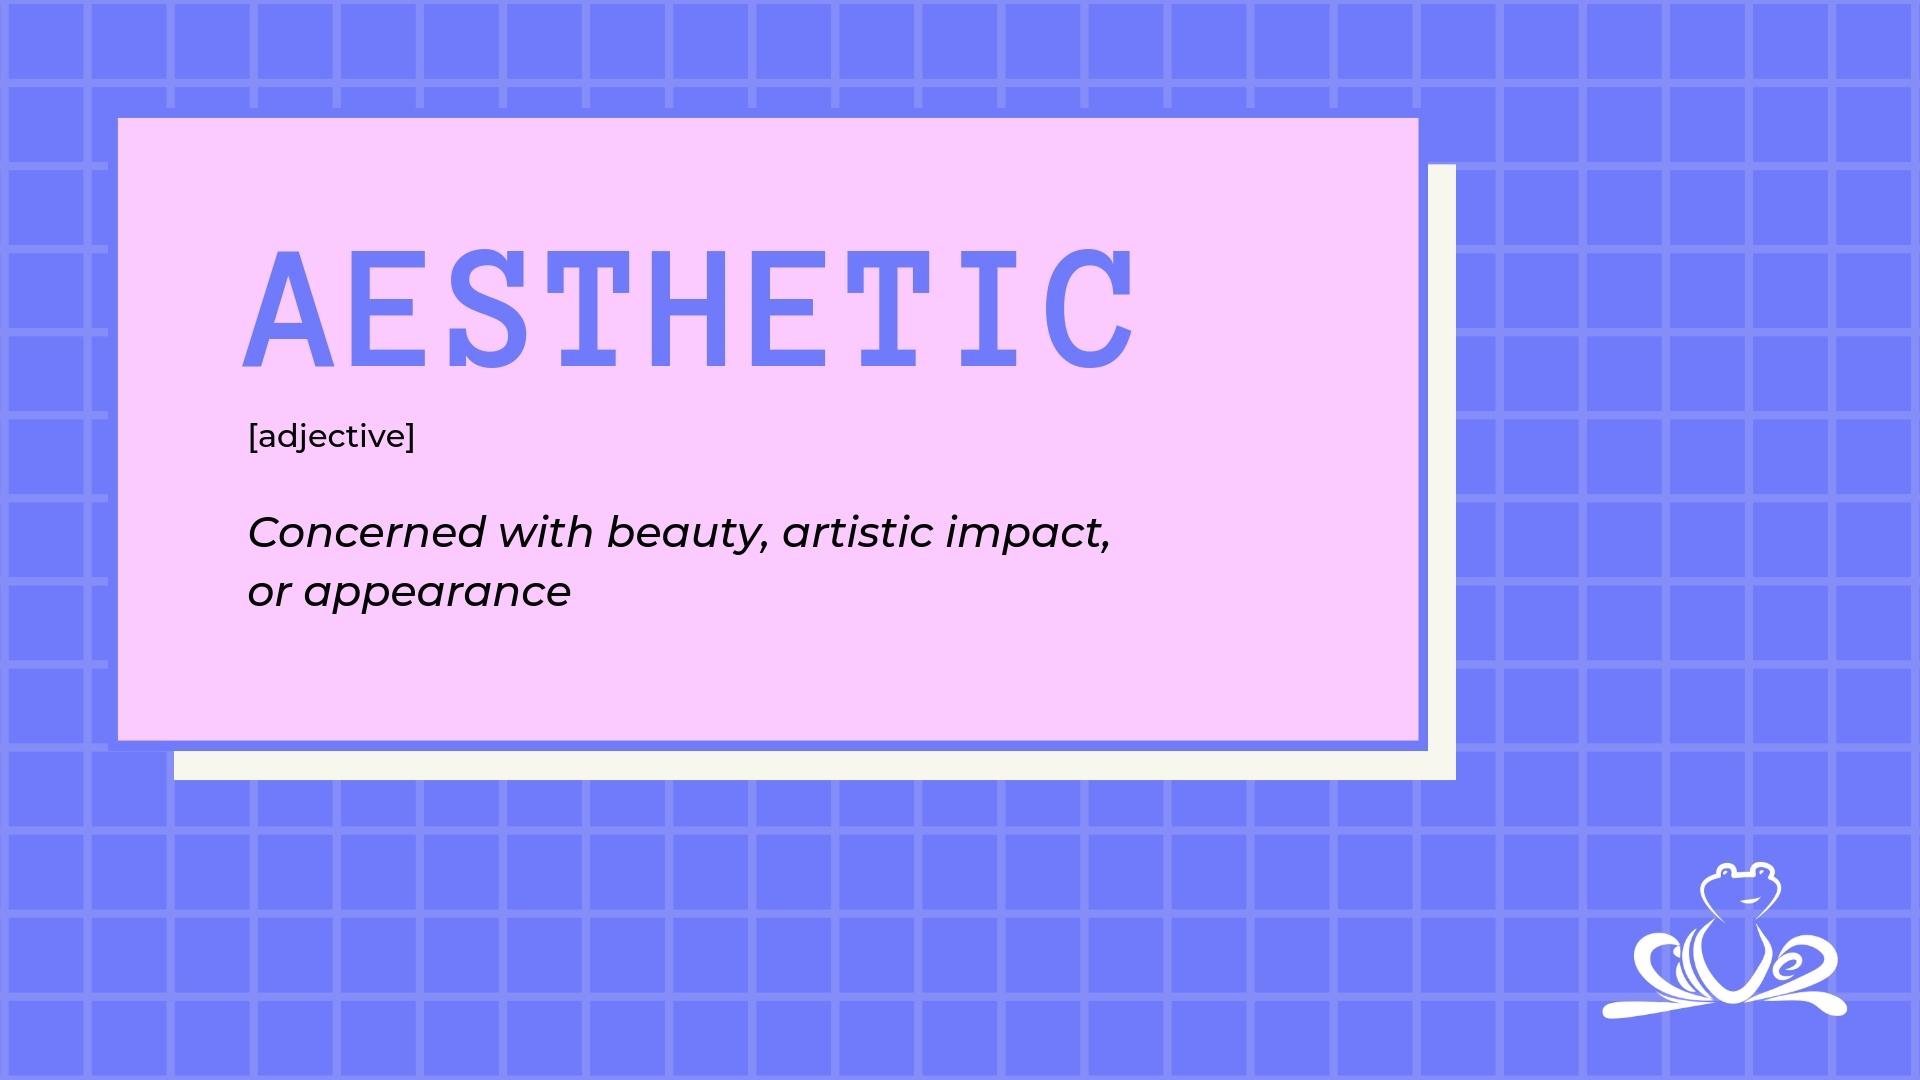 AESTHETIC-2-003